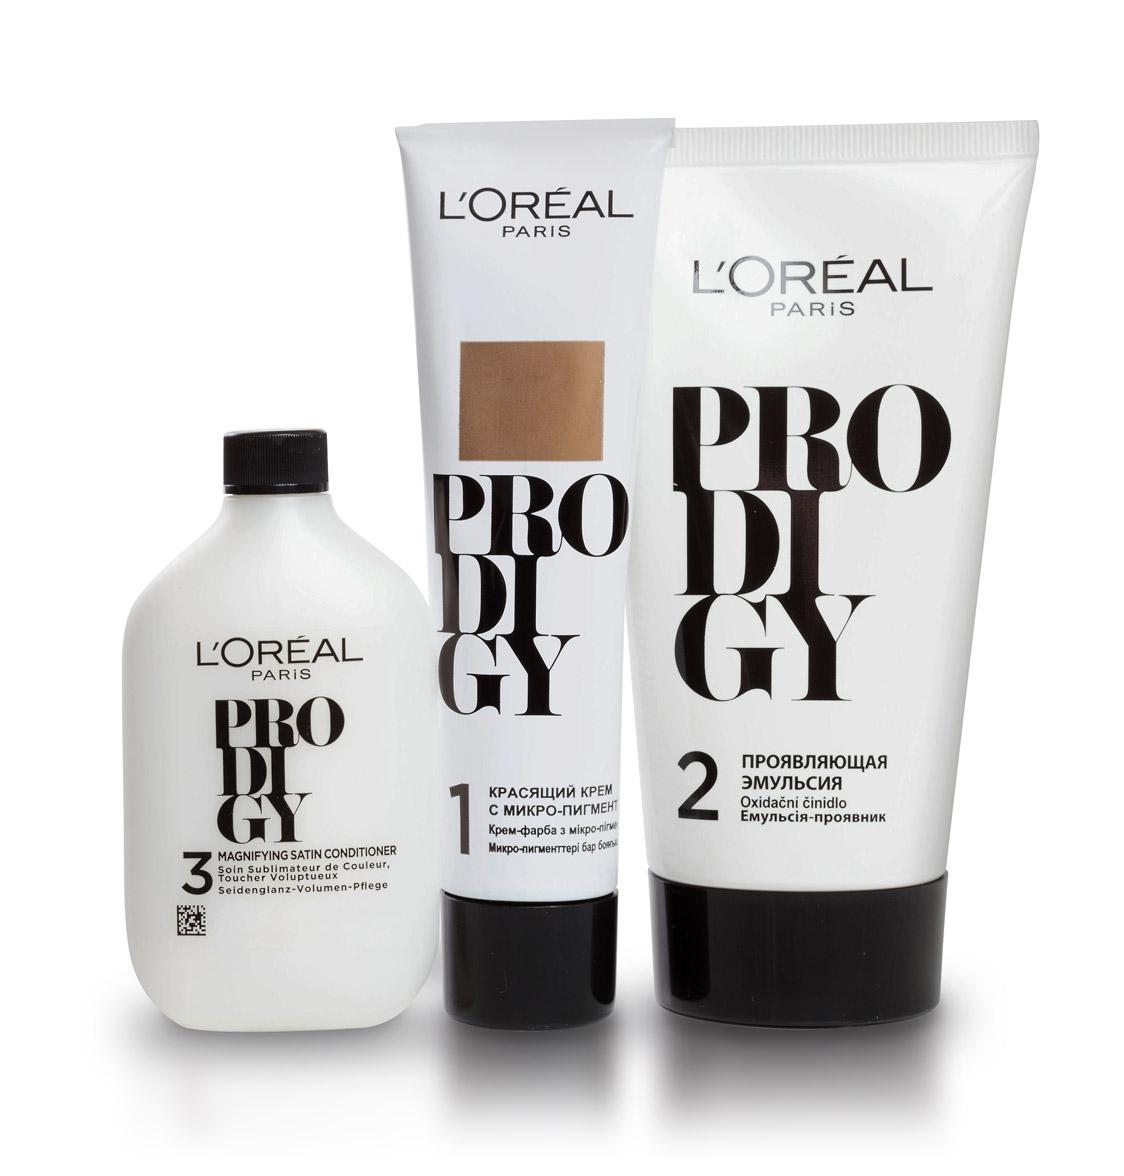 L'Oreal ParisКраска для волос